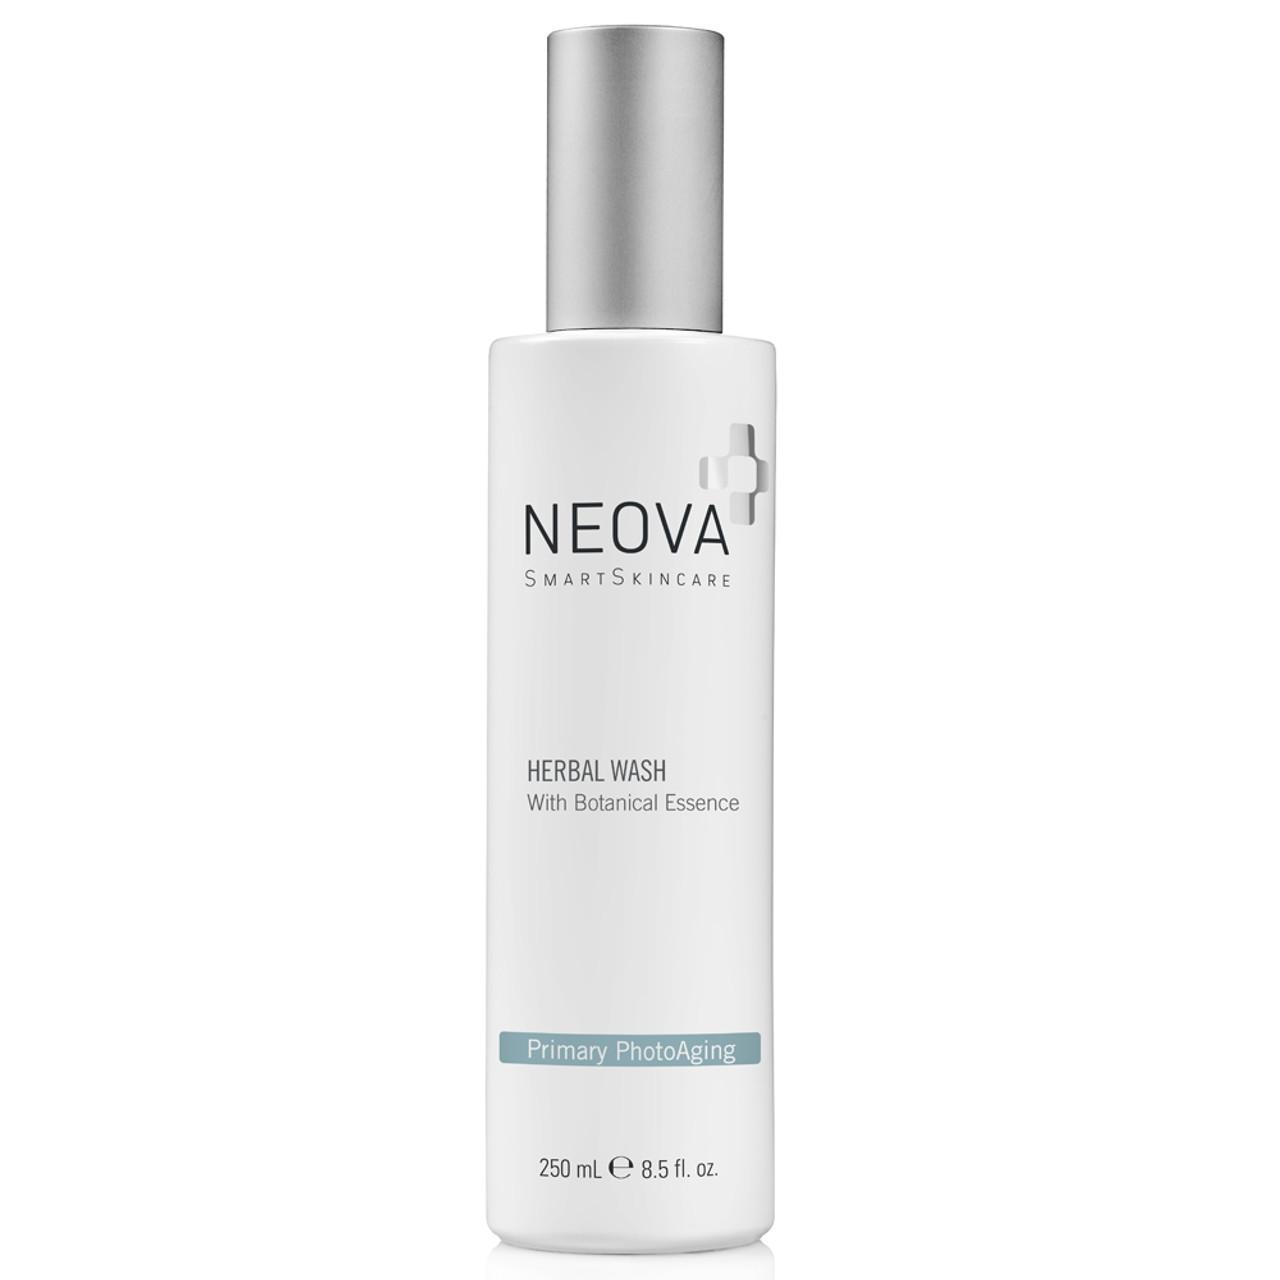 Neova Herbal Wash